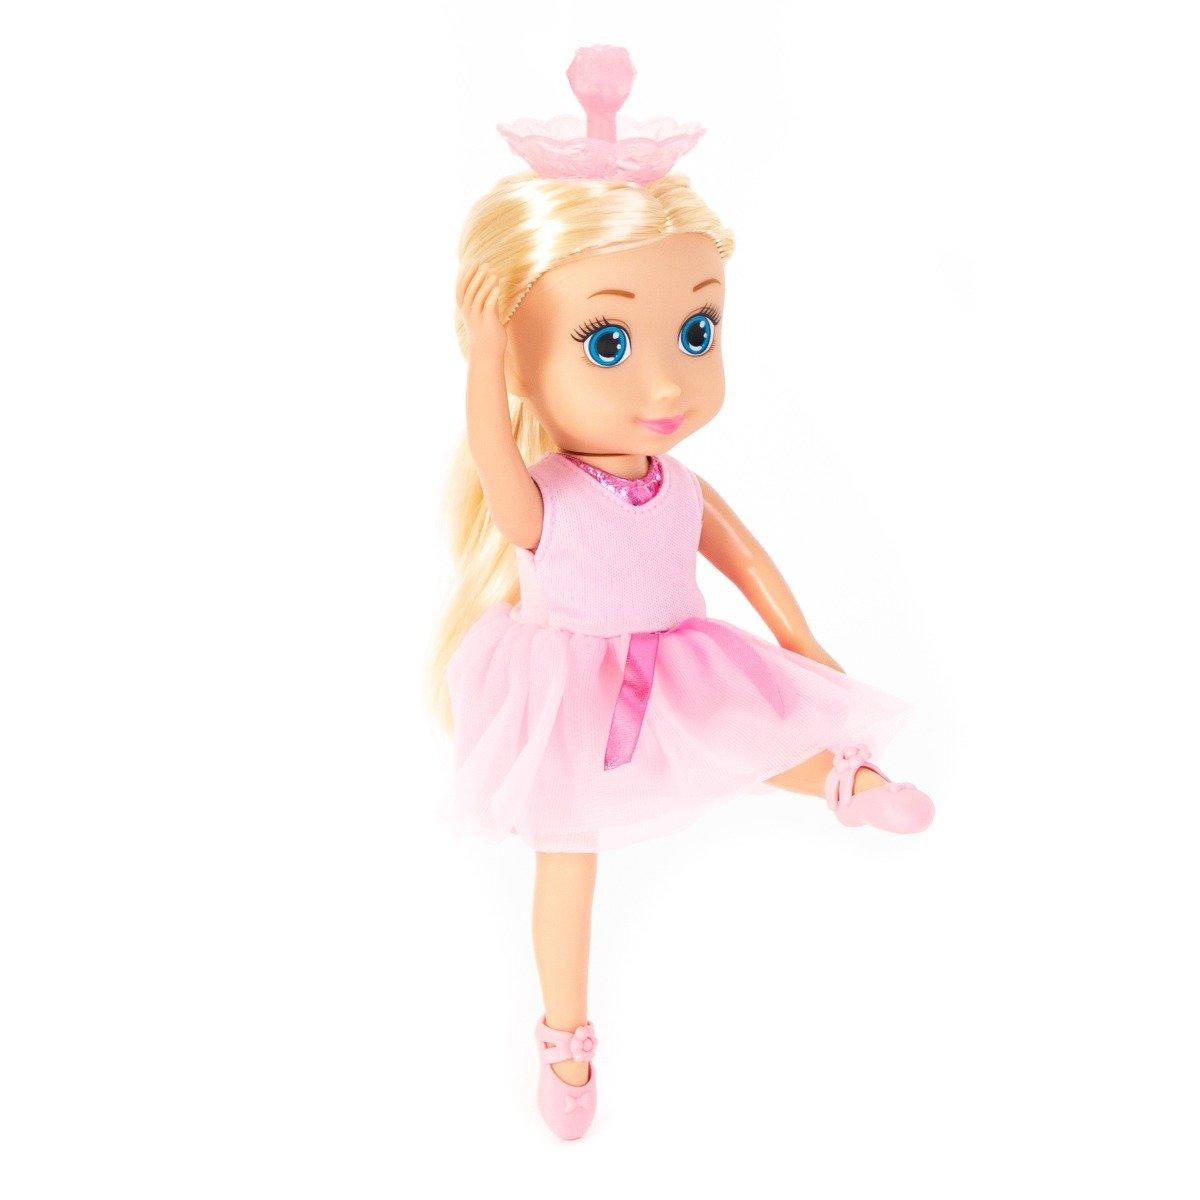 Papusa Maia Mini Balerina, Blonda